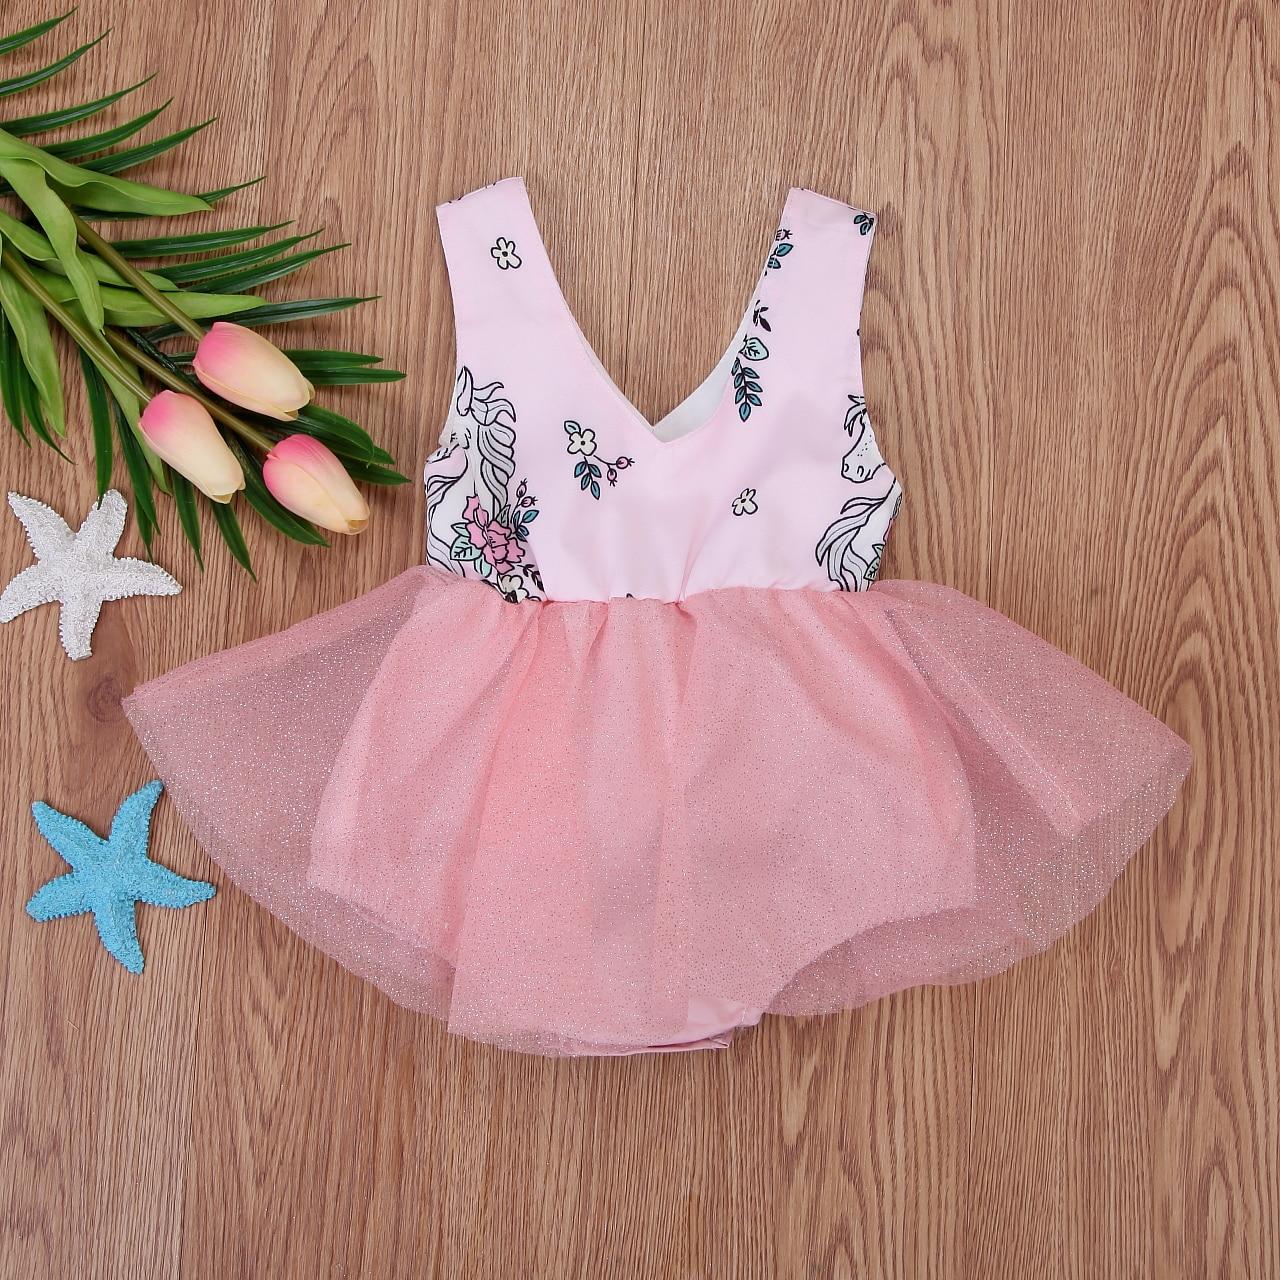 USA Newborn Baby Girls Unicorn Half Sleeve Tutu Lace Dress Skirt Romper Outfits